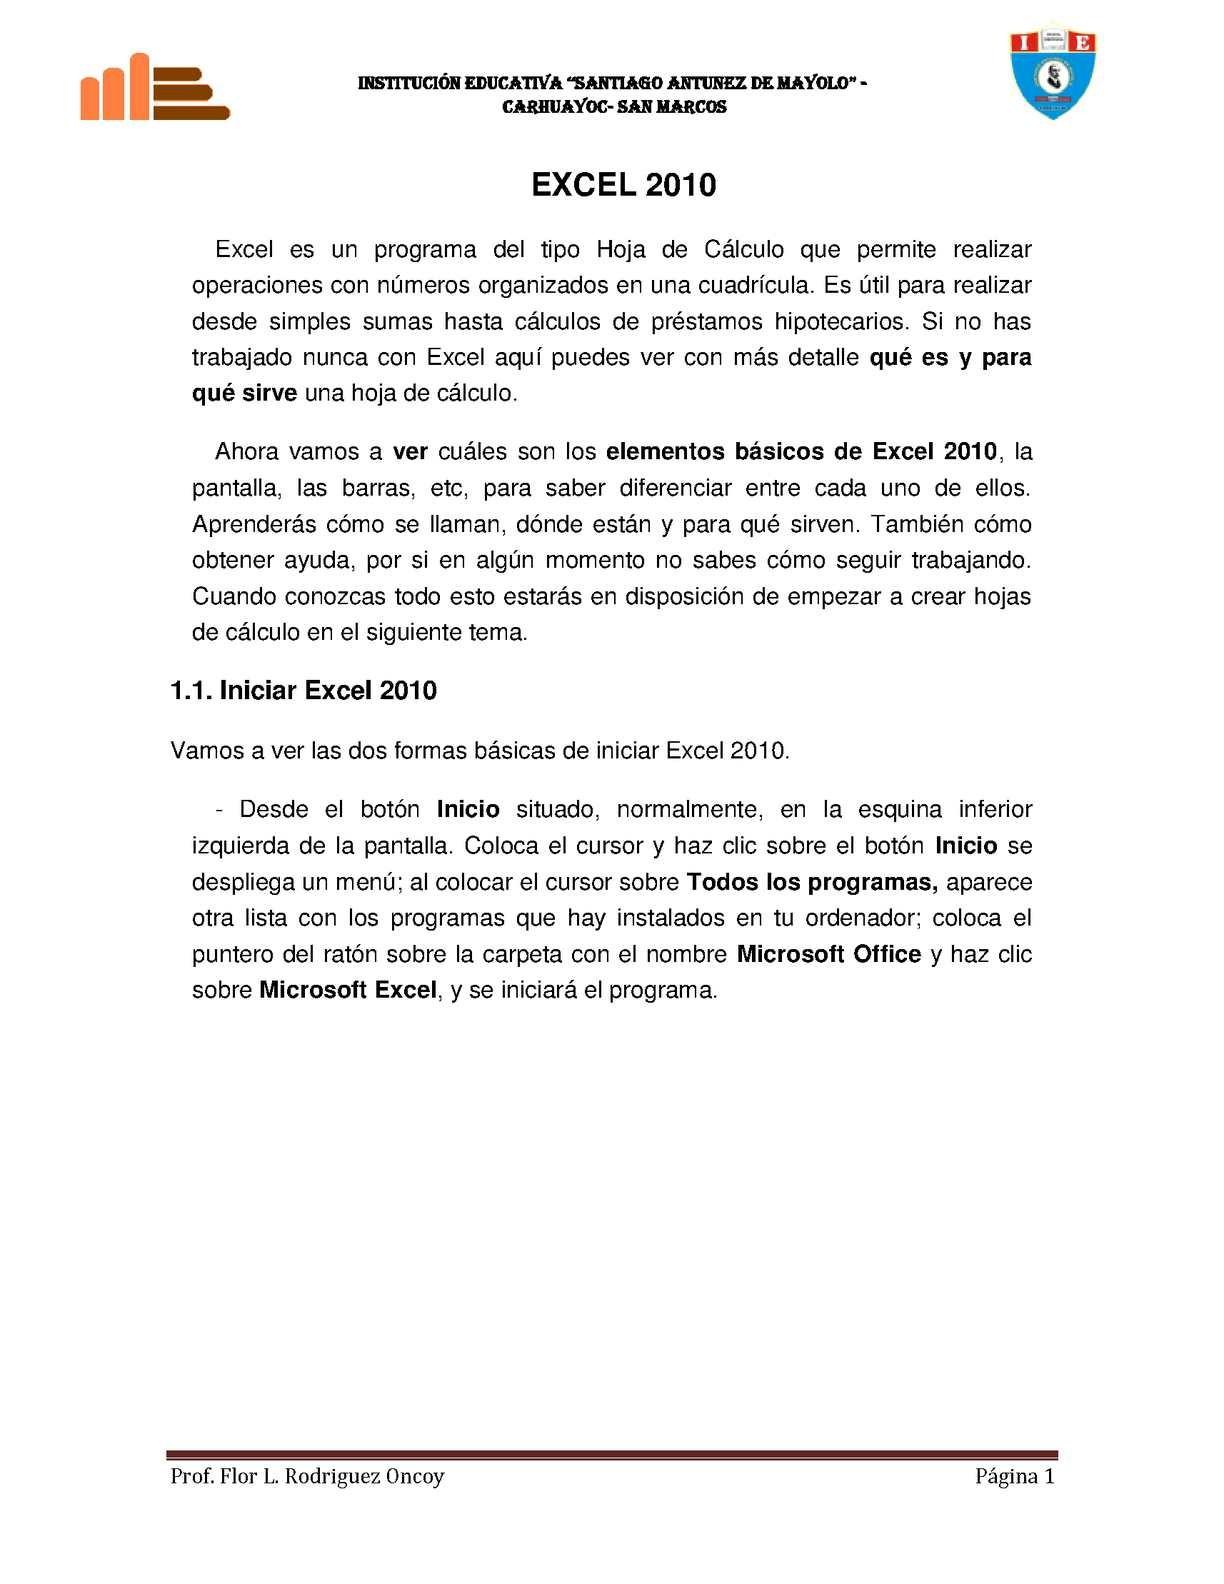 Calendario 2019 Uniandes Más Arriba-a-fecha Están Mas Detalle Aqui Dogmagazine